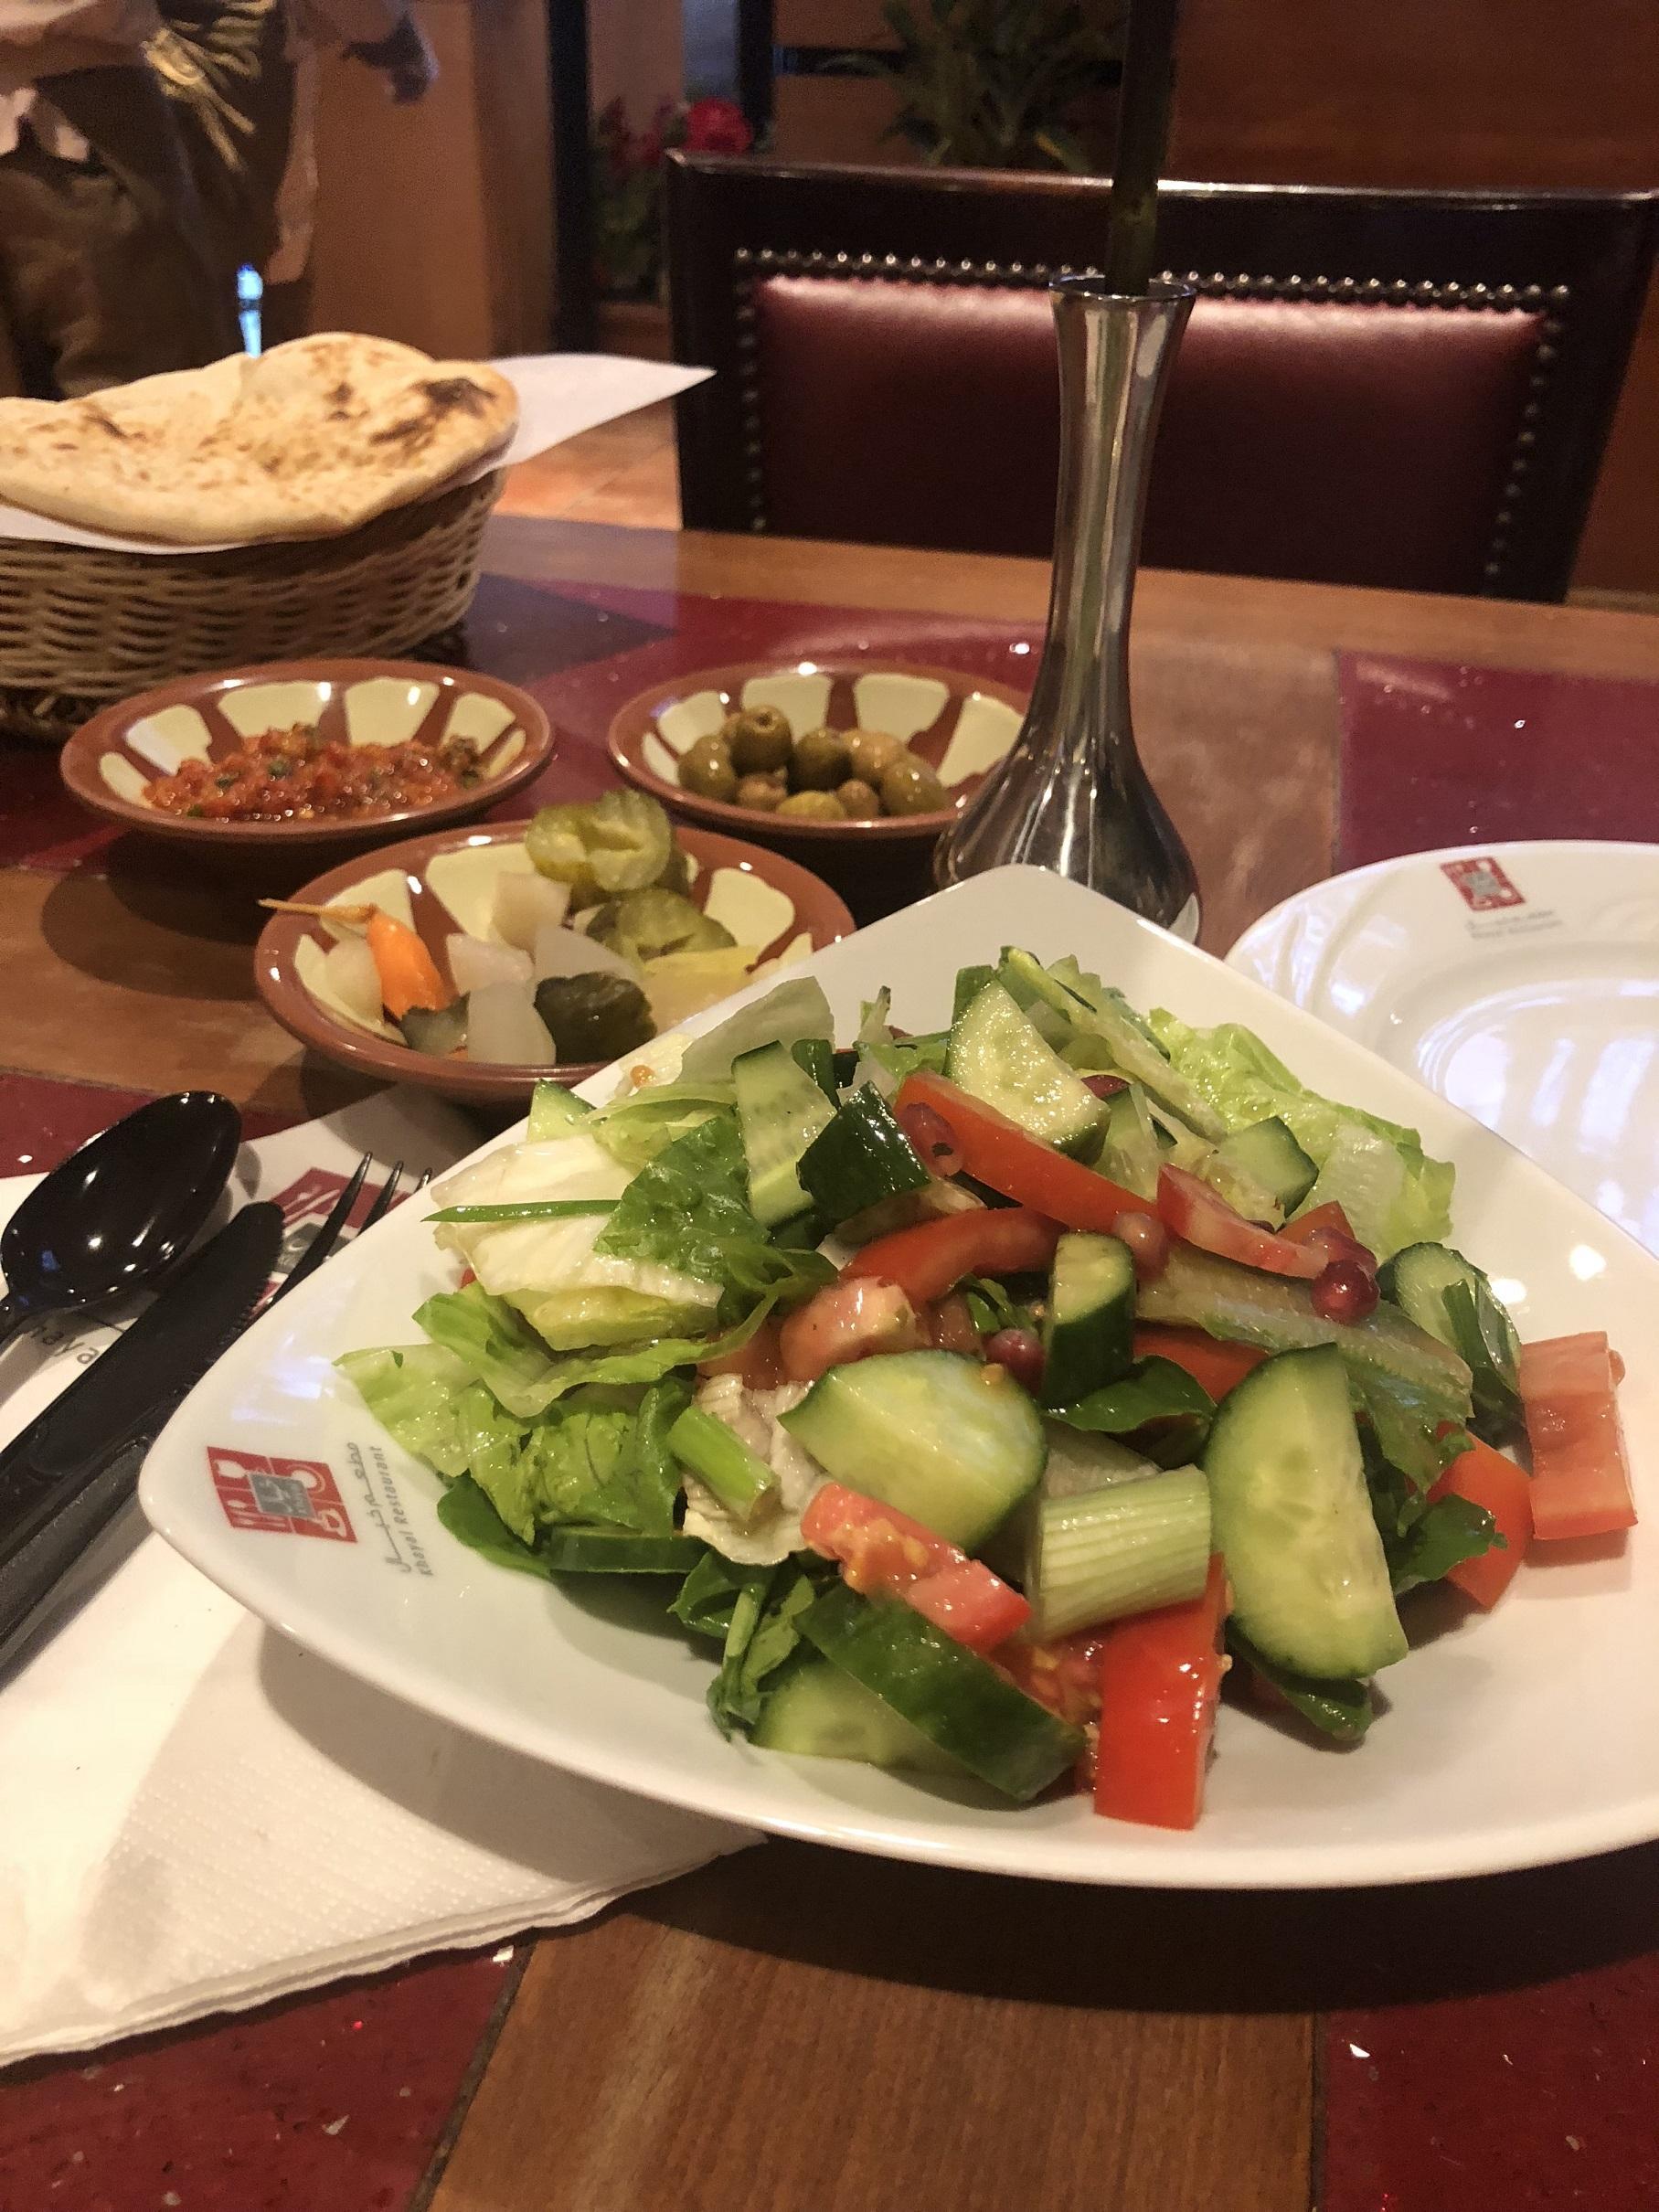 للحلوين صوري مطعم خيال بجدهـ عشاق المشاوي